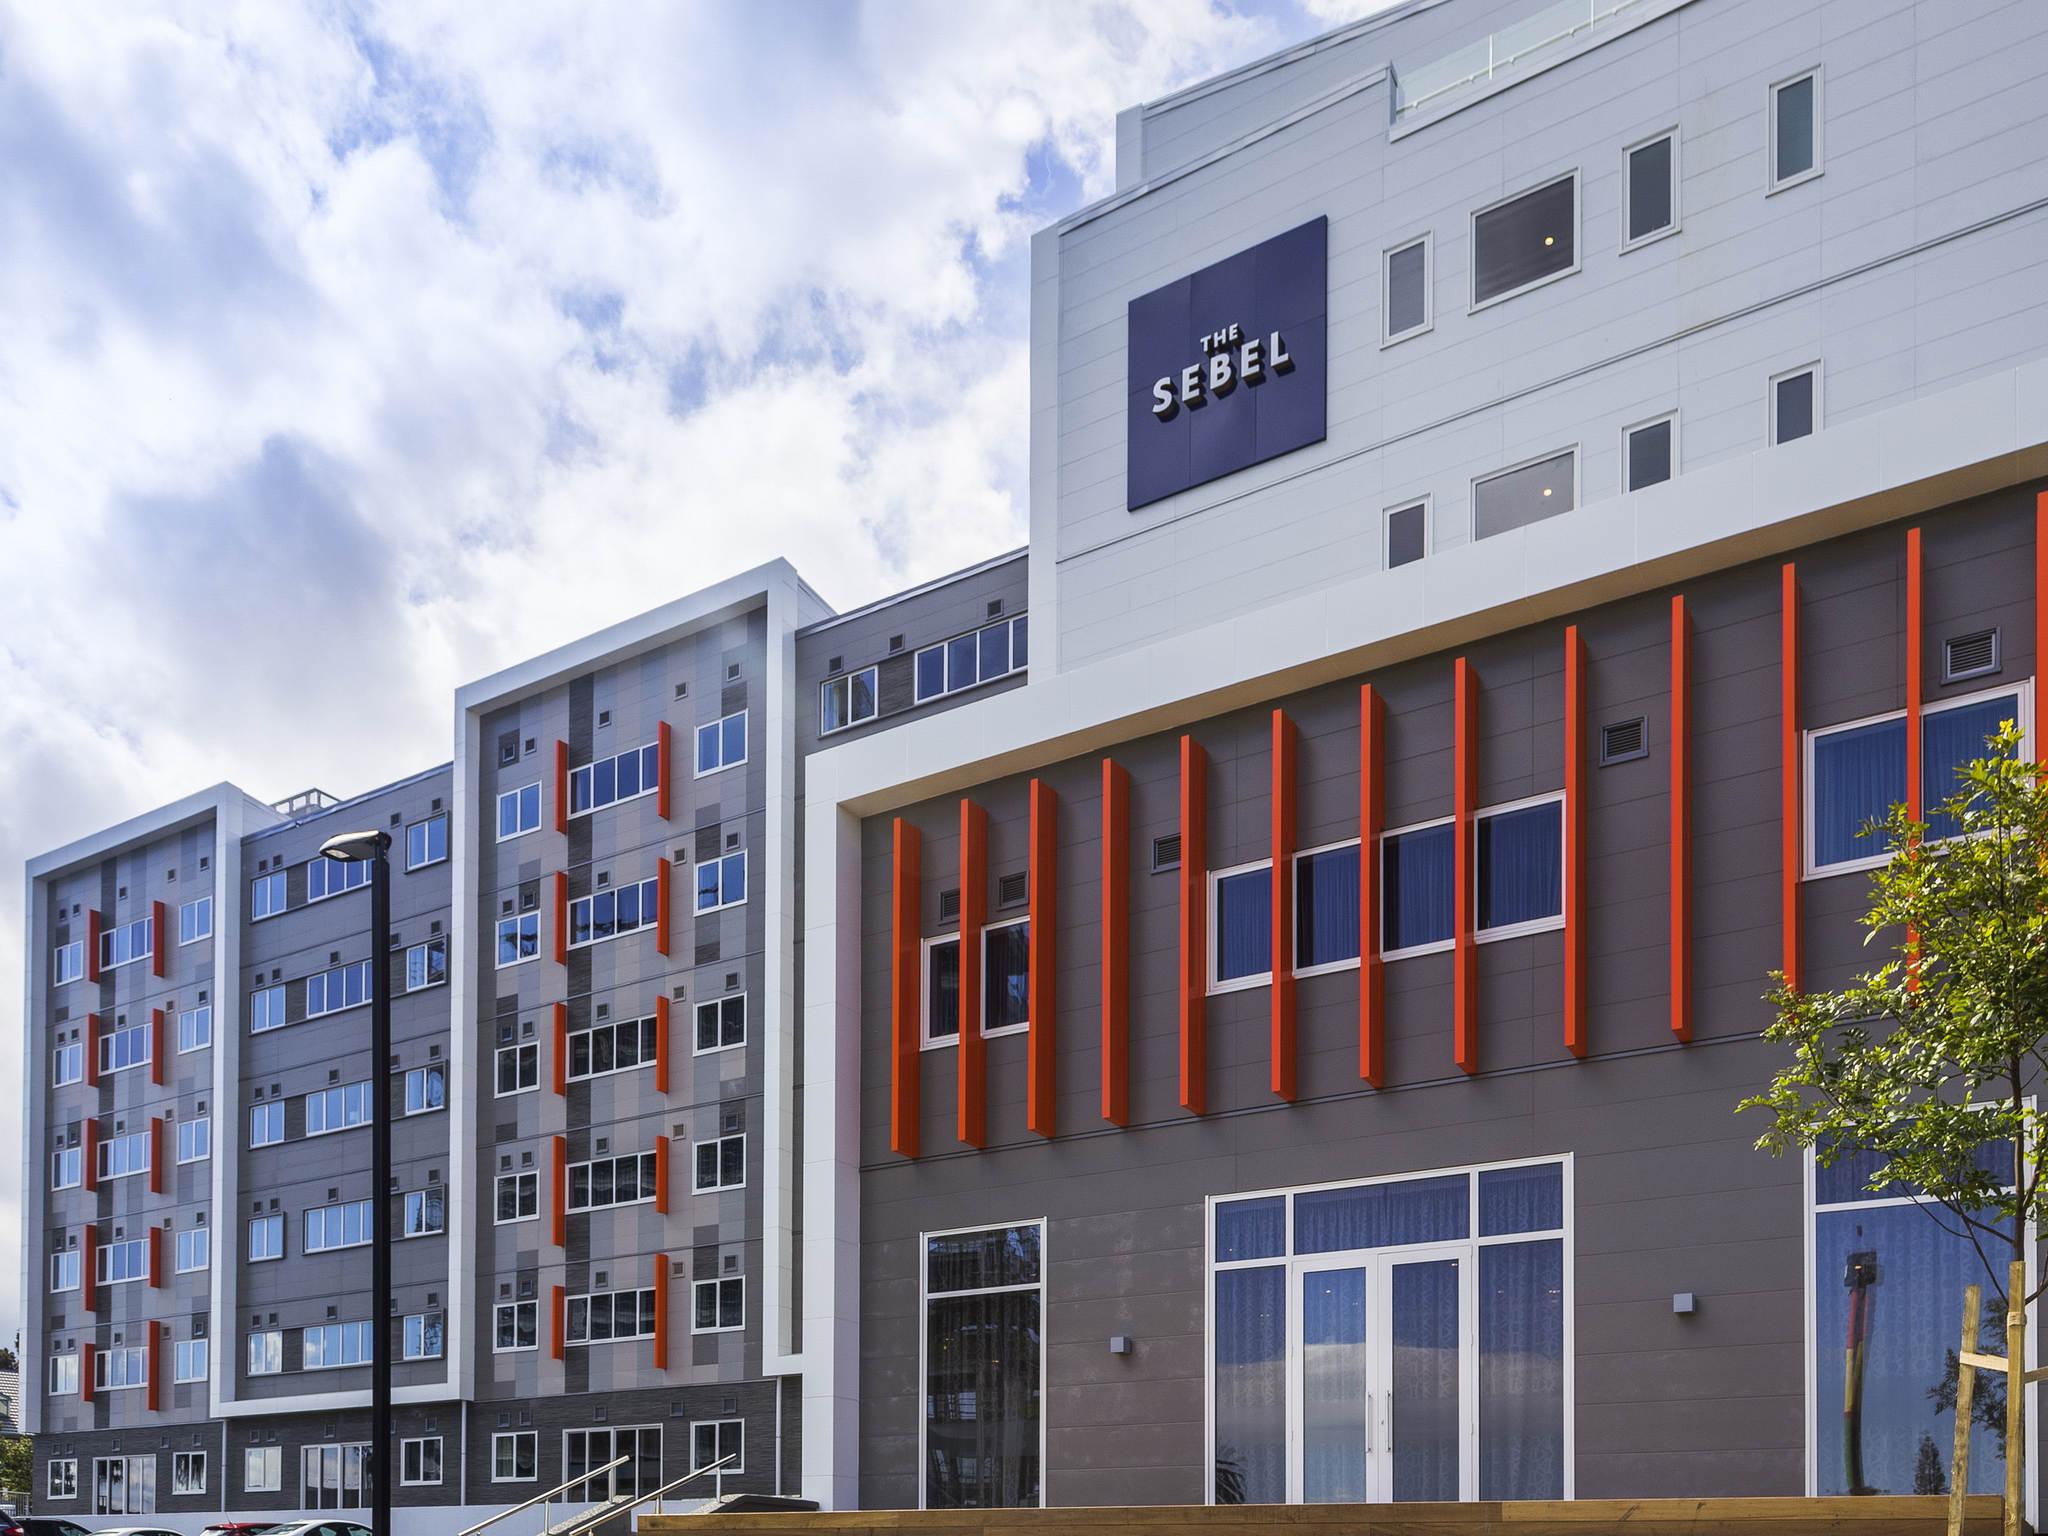 Hotel – Hotel Sebel Auckland Mankau